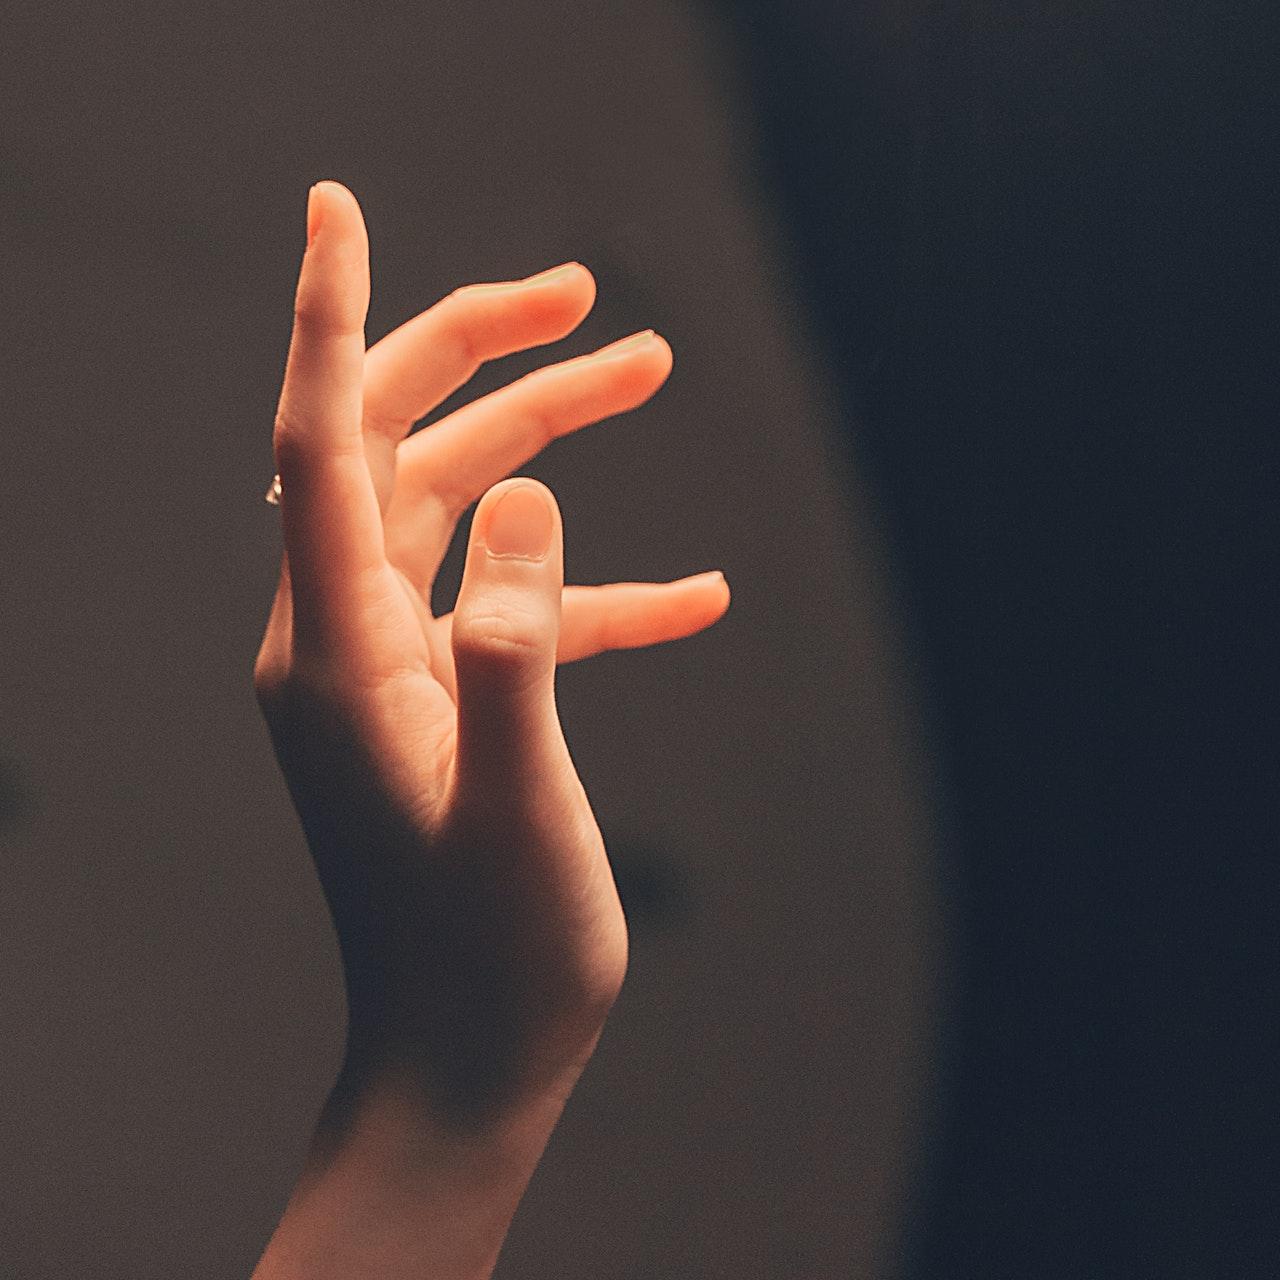 Essence of Hand - Embodiment Practice